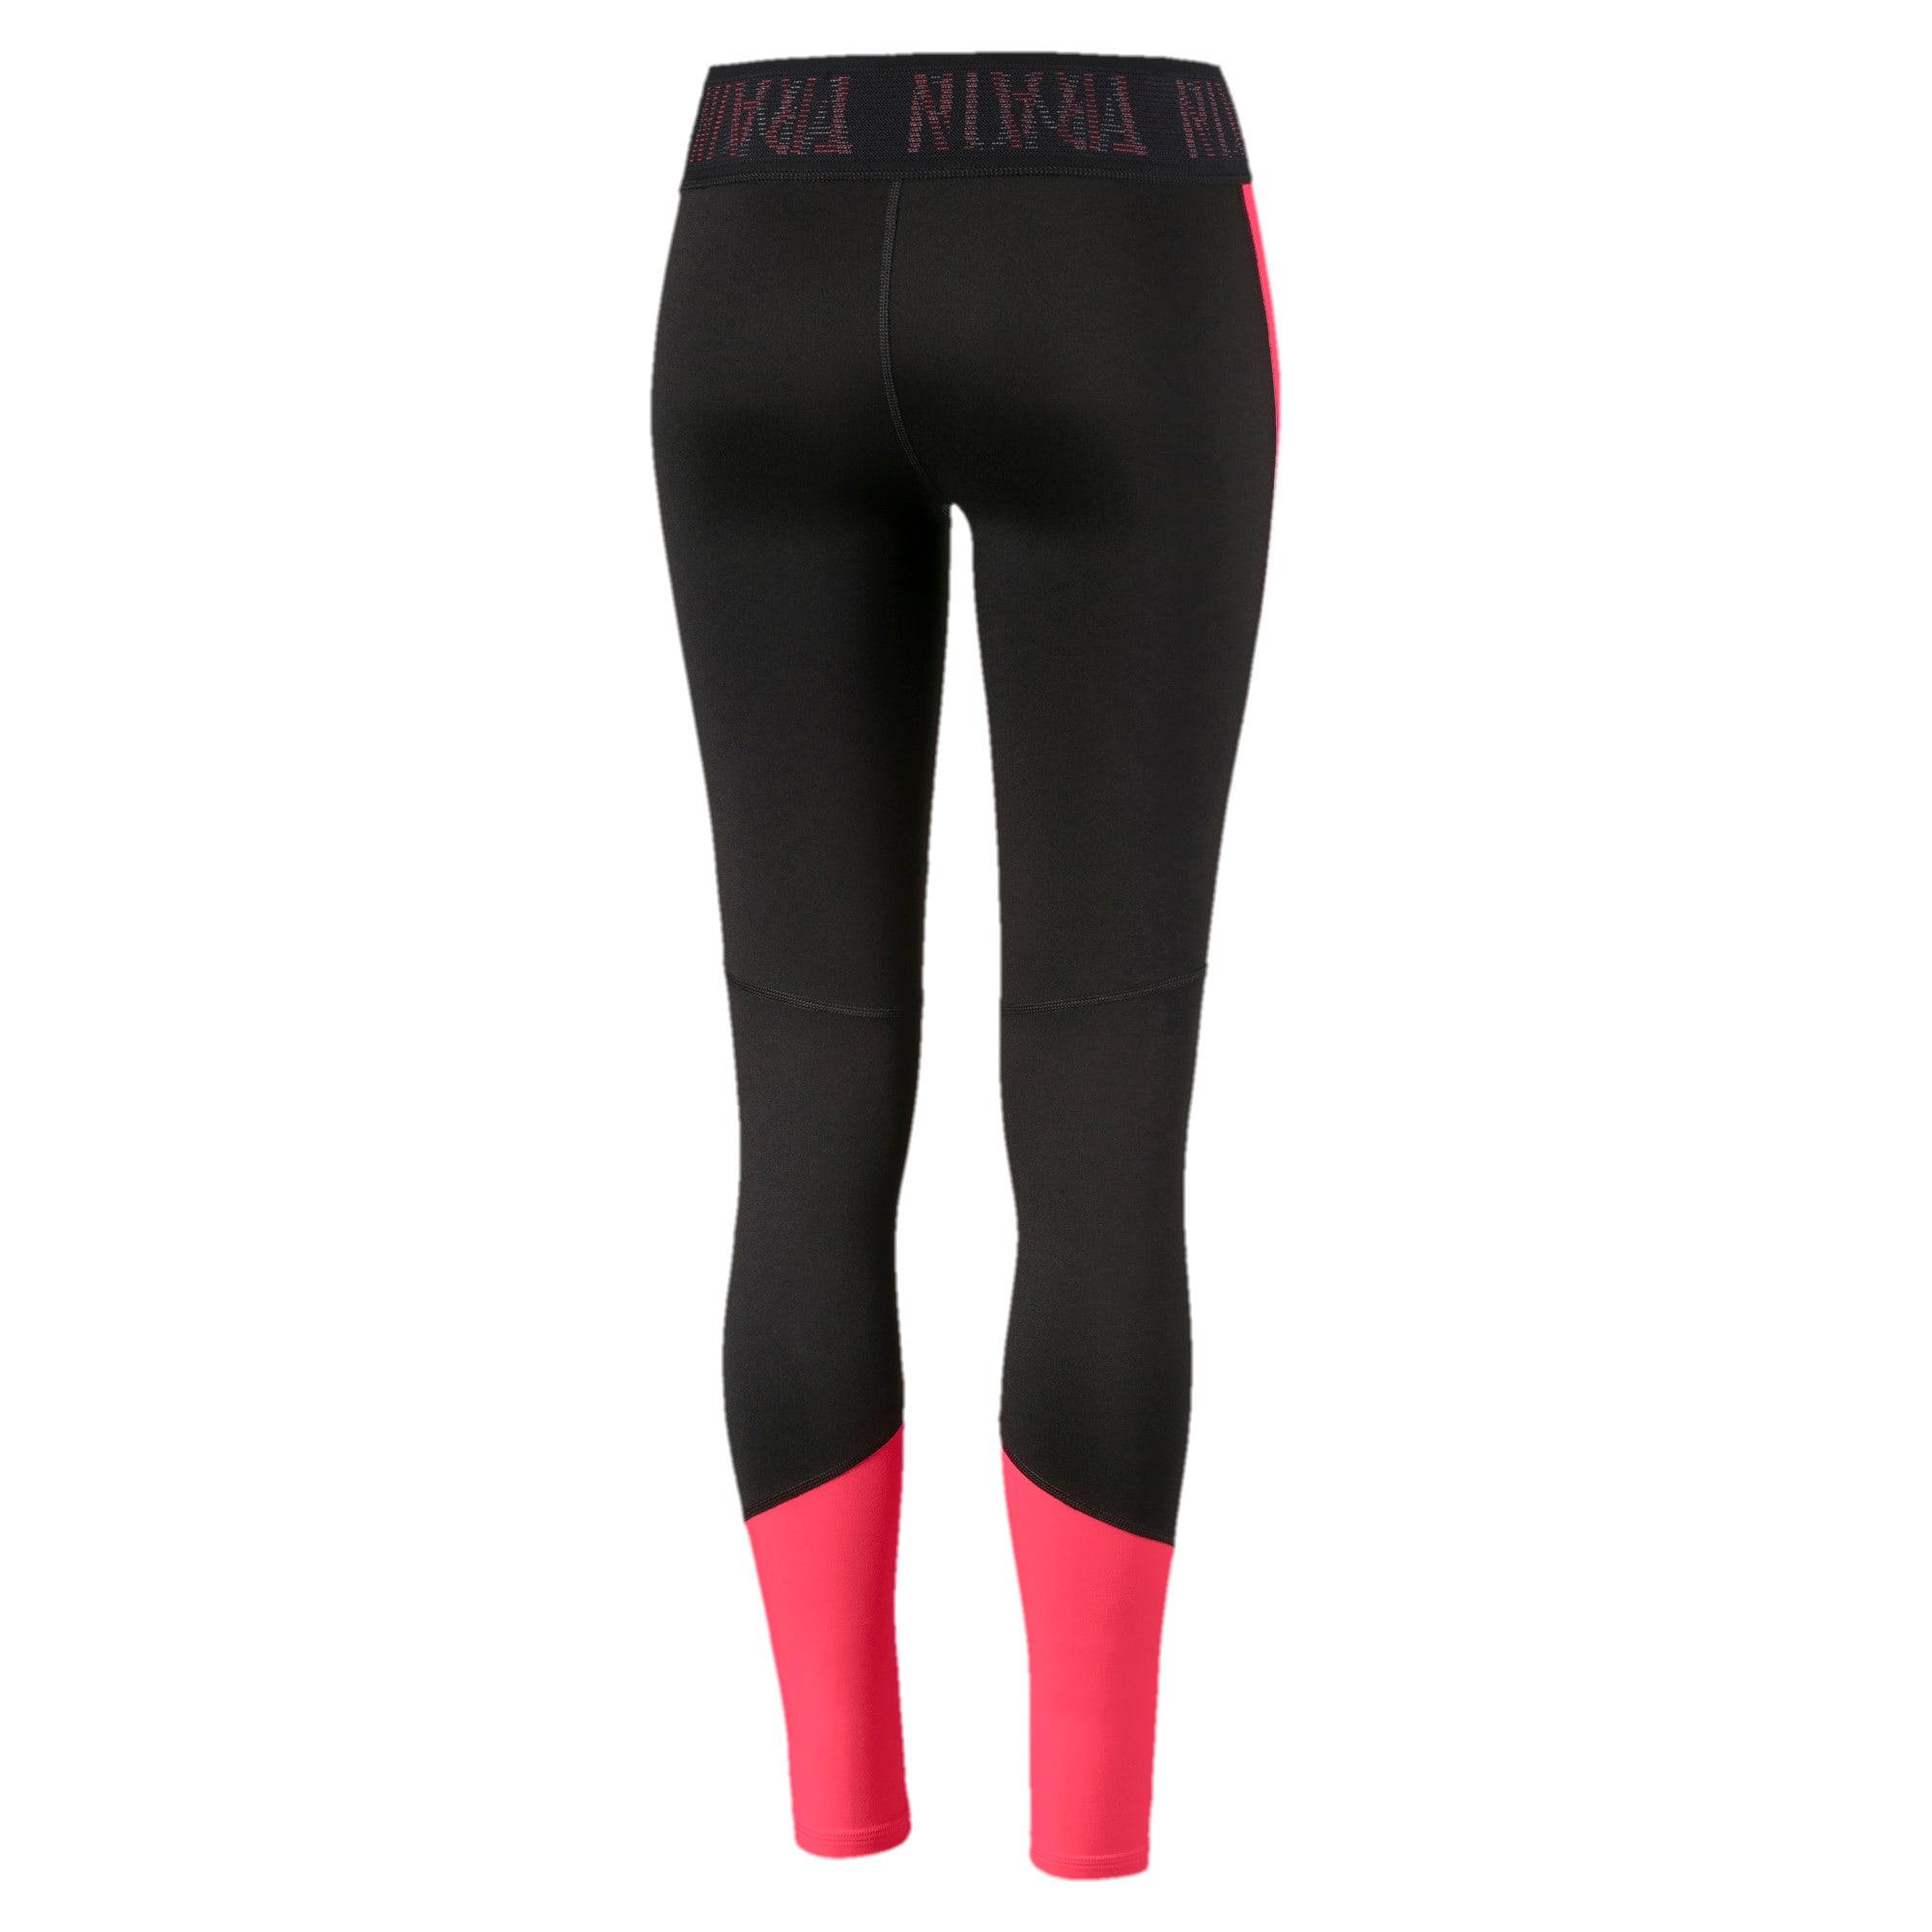 Thumbnail 5 of ADHM 2019 Logo 7/8 Women's Training Leggings, Puma Black-Pink Alert, medium-IND